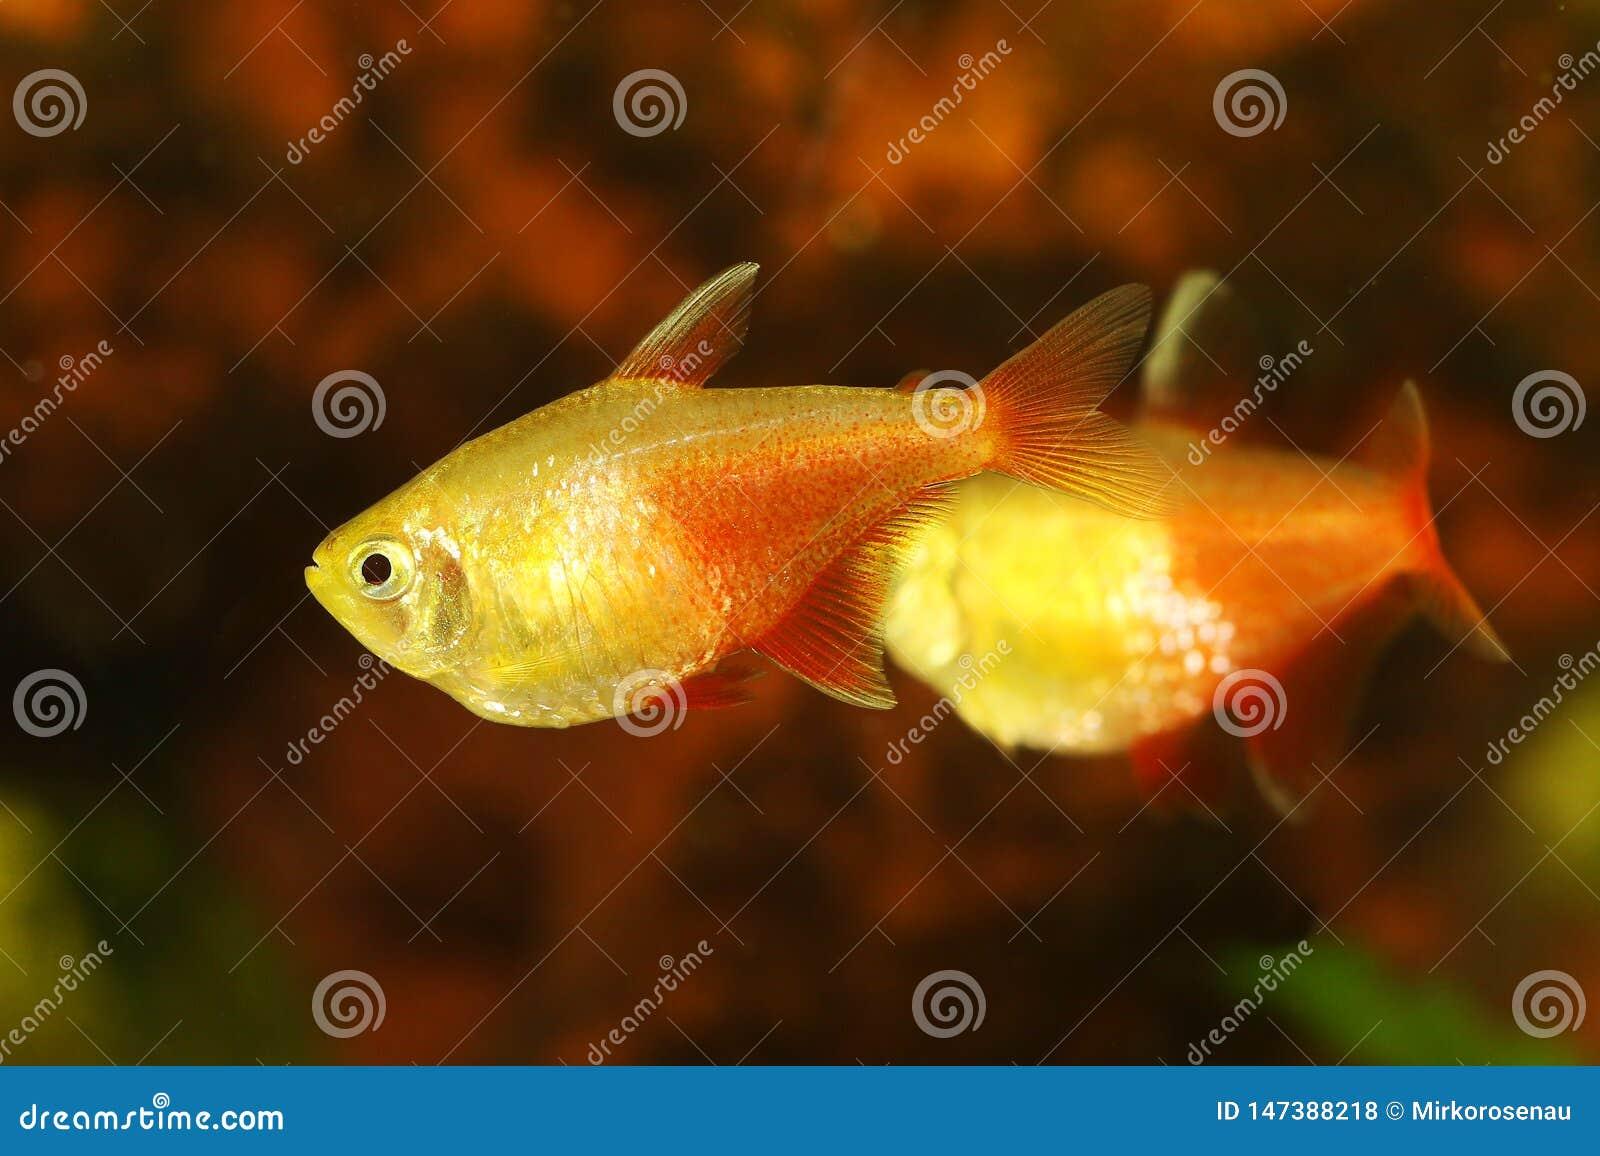 Aquarium fish Red Flame Tetra Hyphessobrycon flammeus Rio tetra tropical